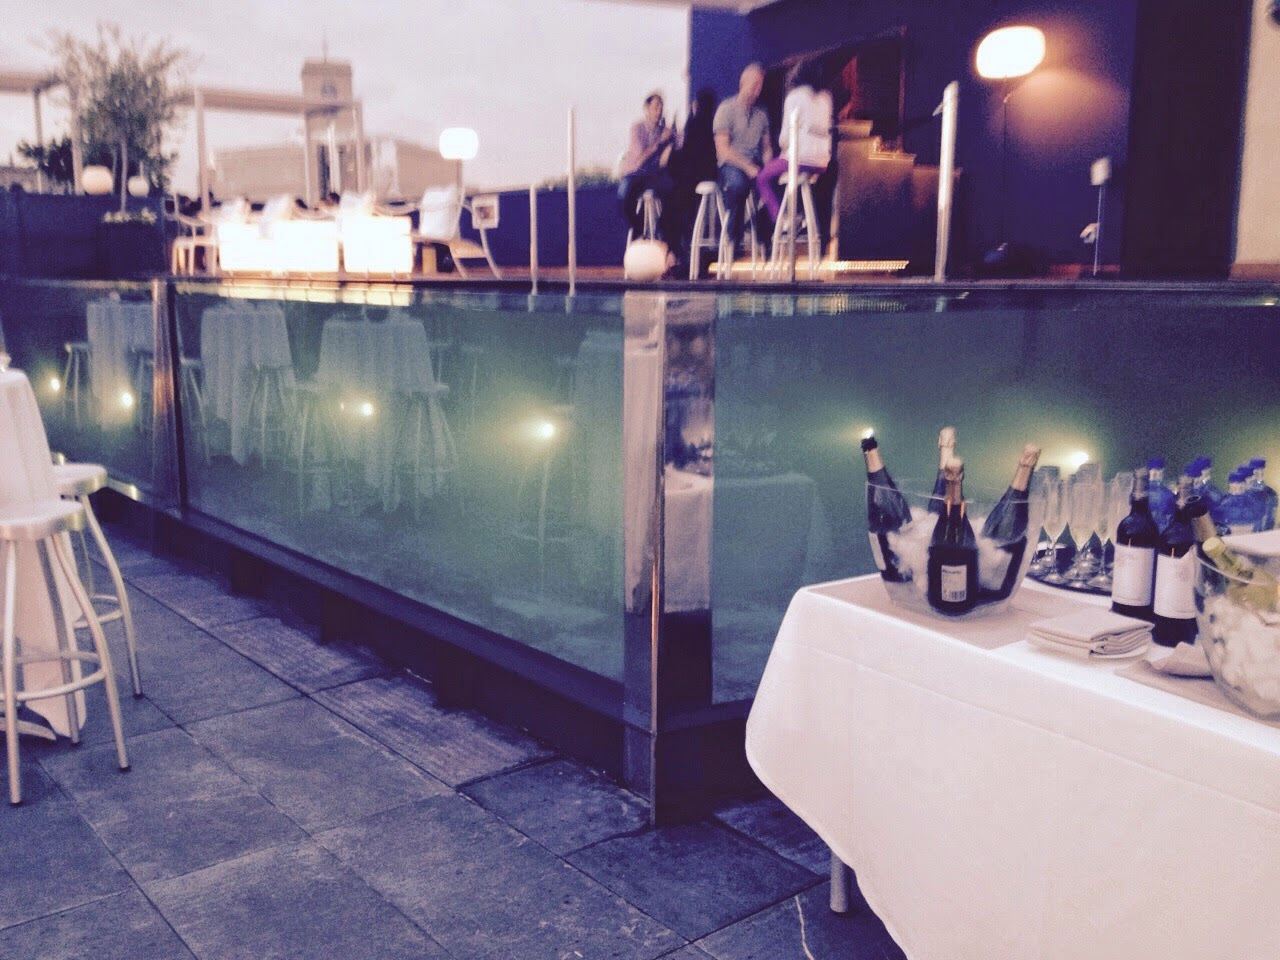 magica barcelona terraza piscina vistas 360º restaurantes cocktails noche ocio